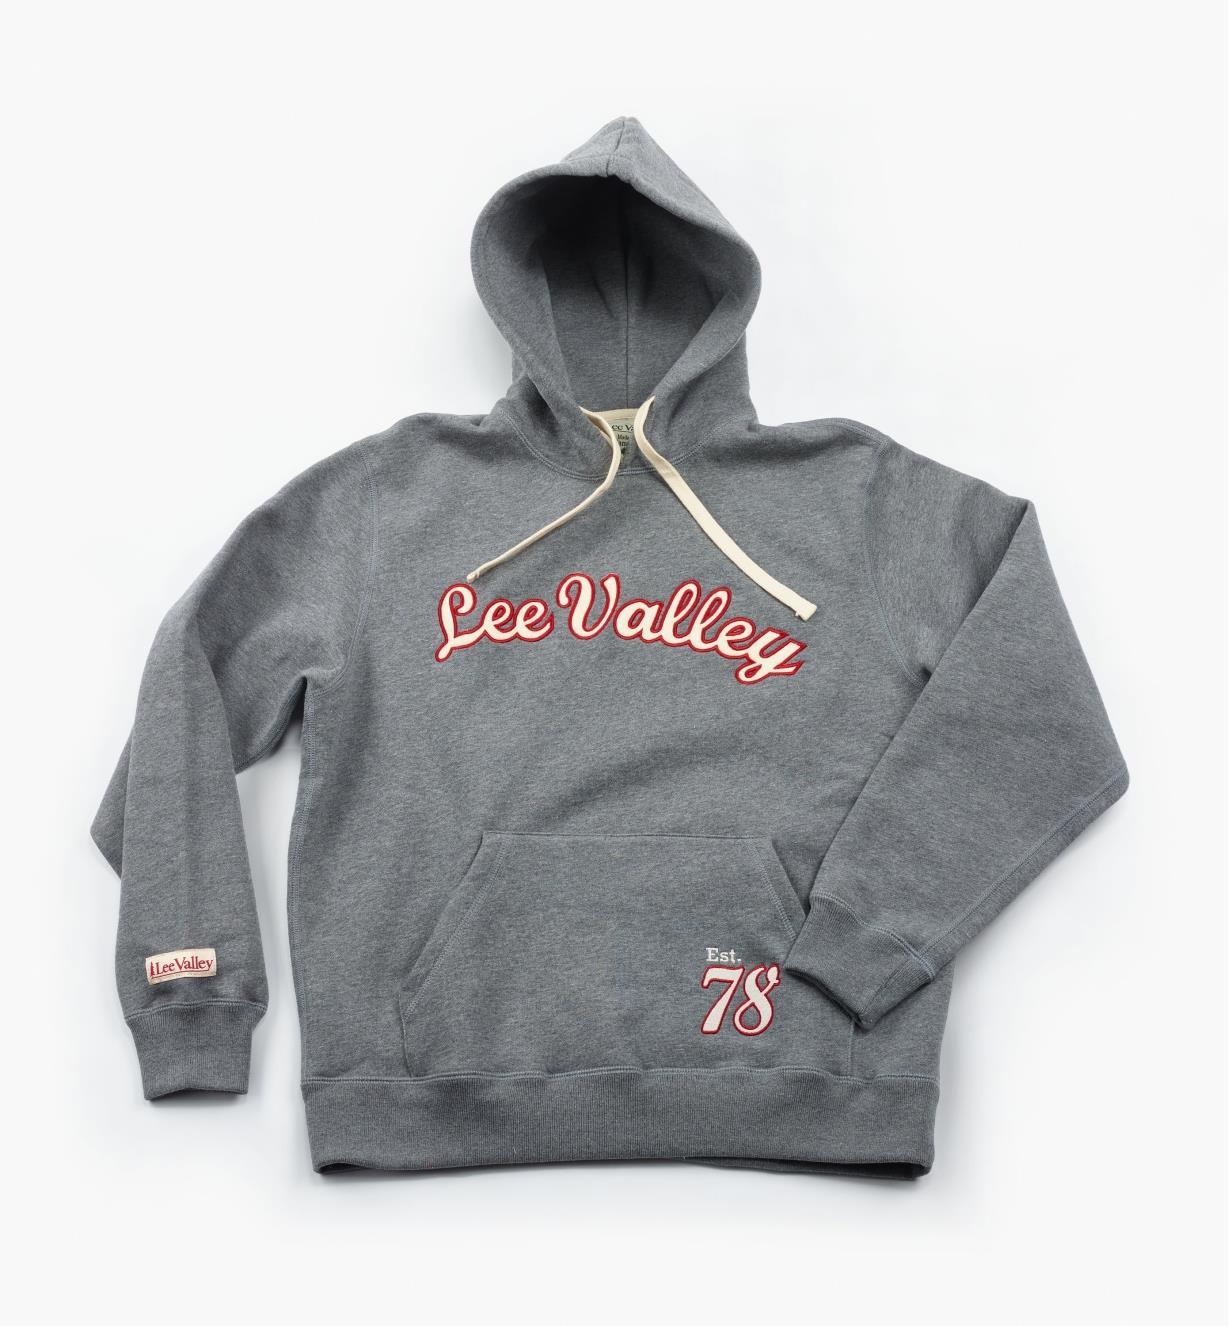 "67K6753 - Large (44""-46"") Gray Lee Valley Pullover Hooded Sweatshirt"